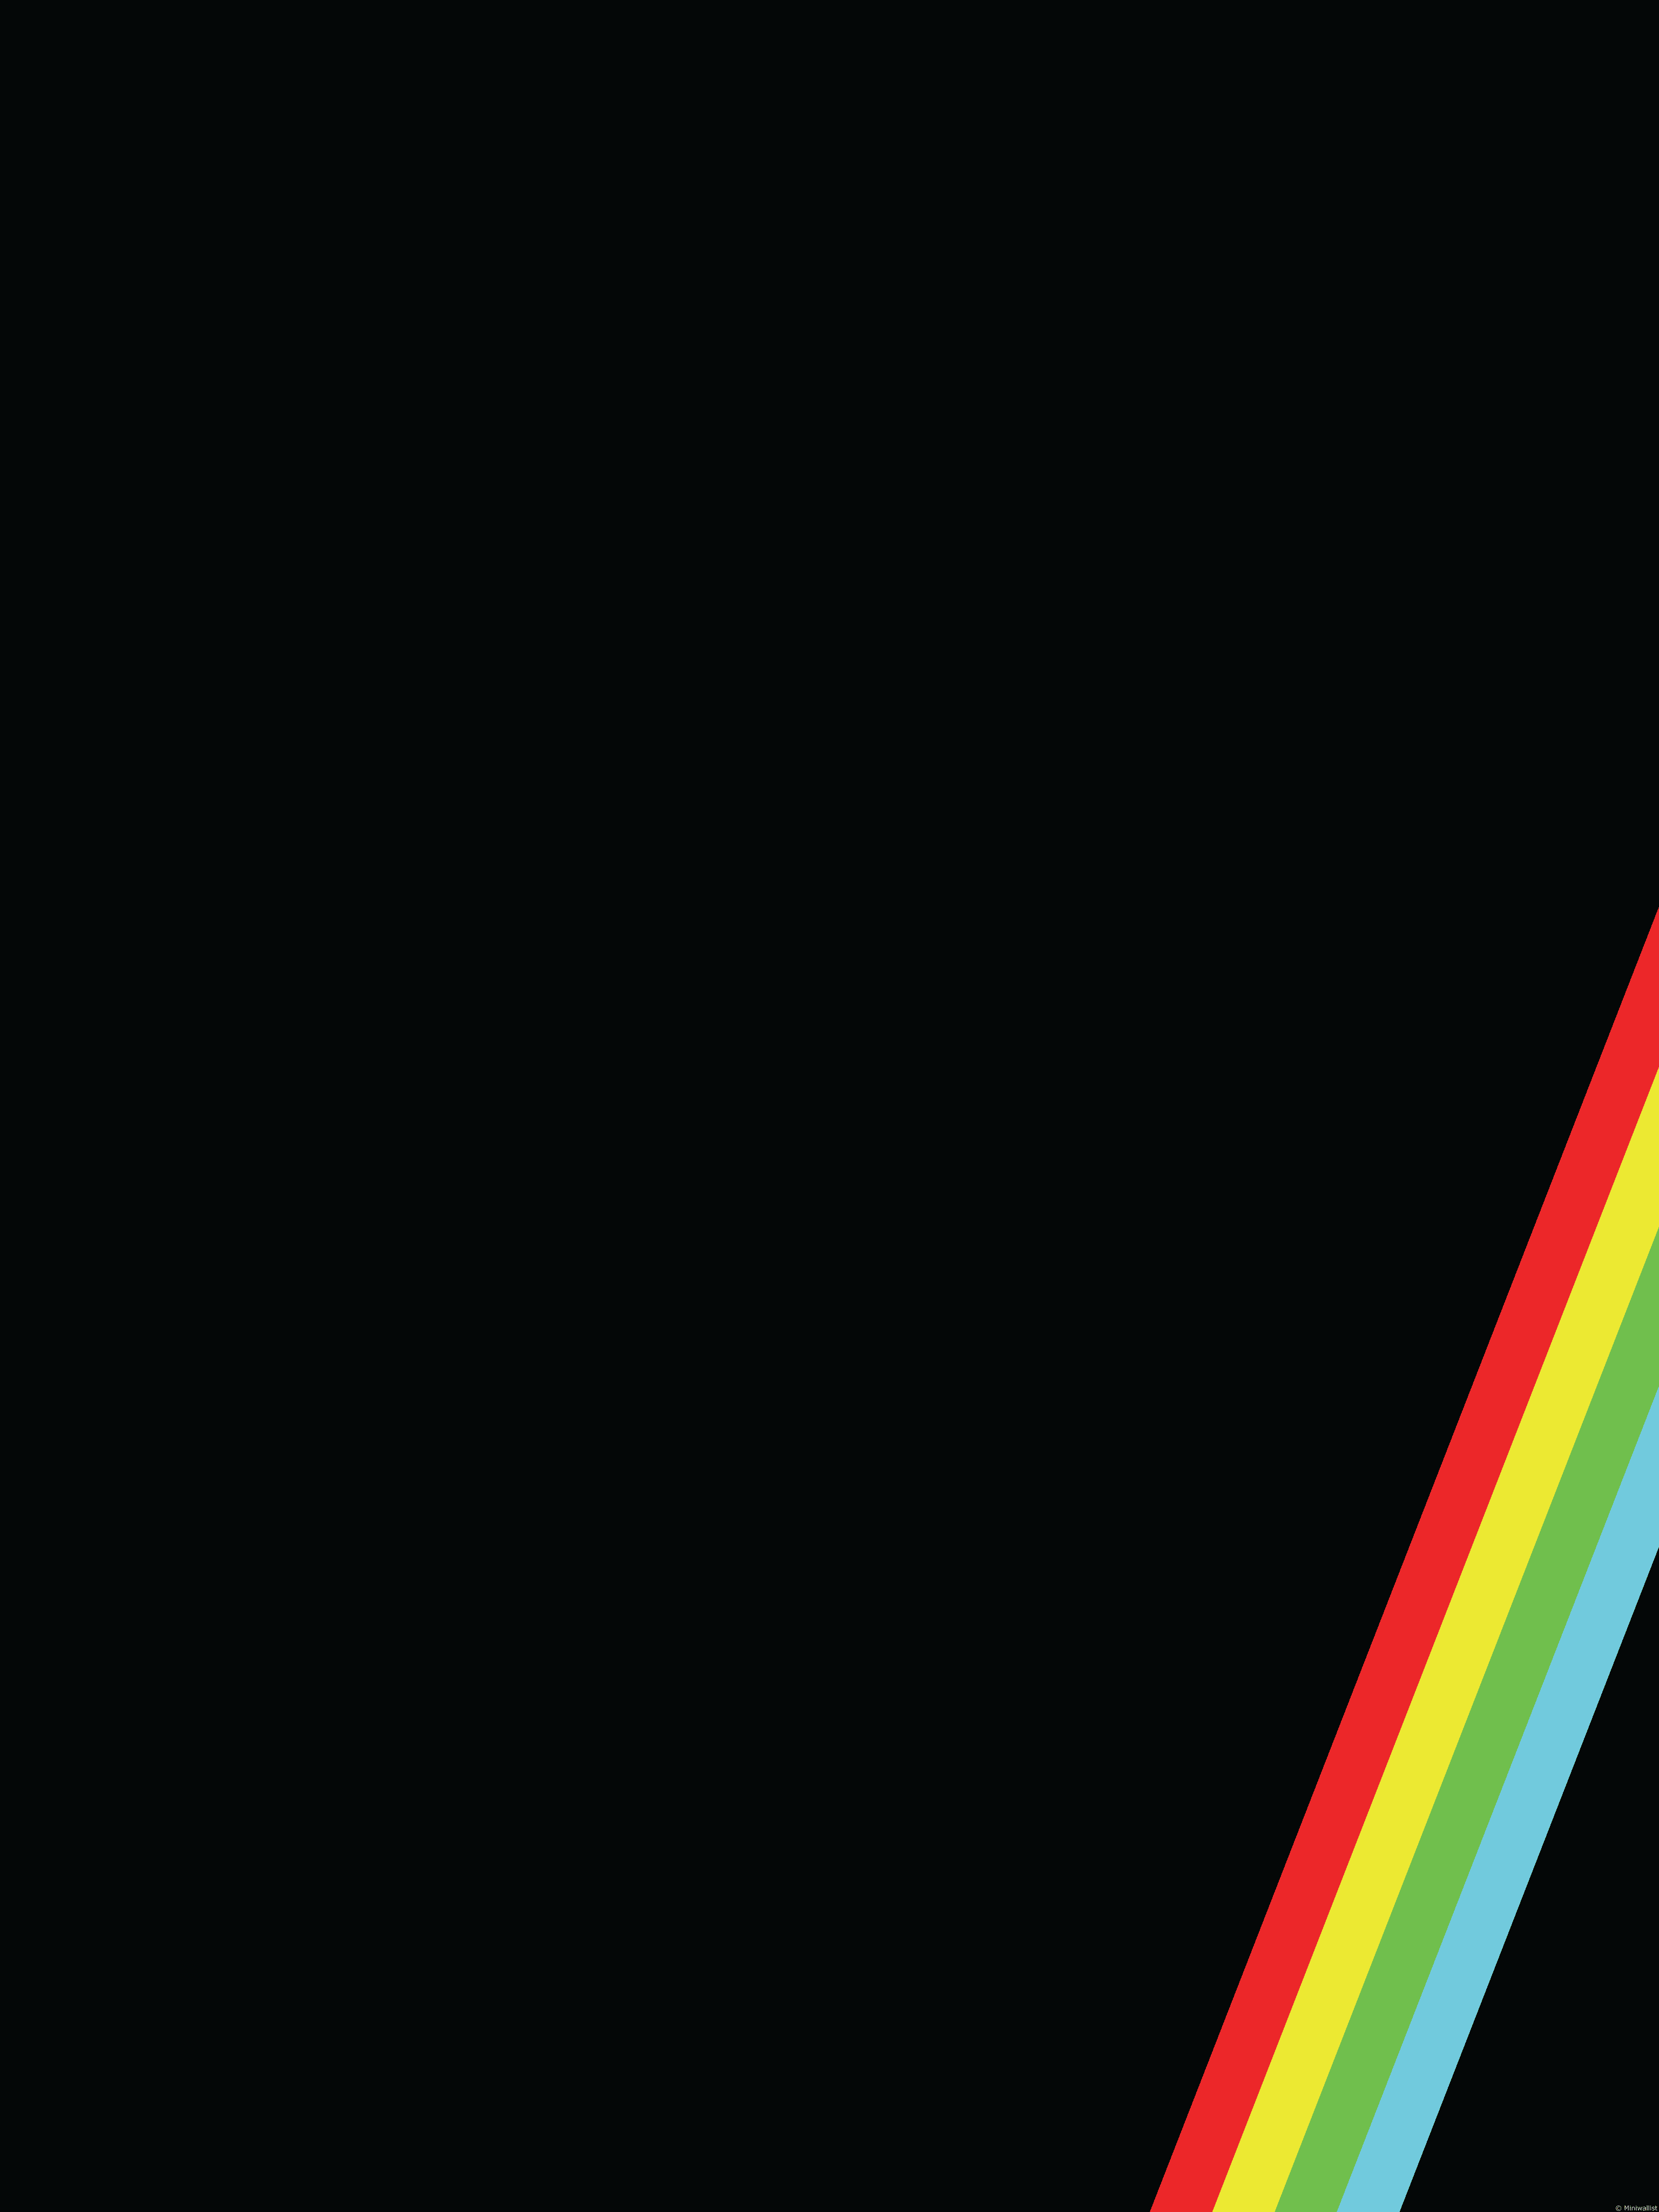 Sinclair Zx Spectrum Mobile Wallpaper Miniwallist